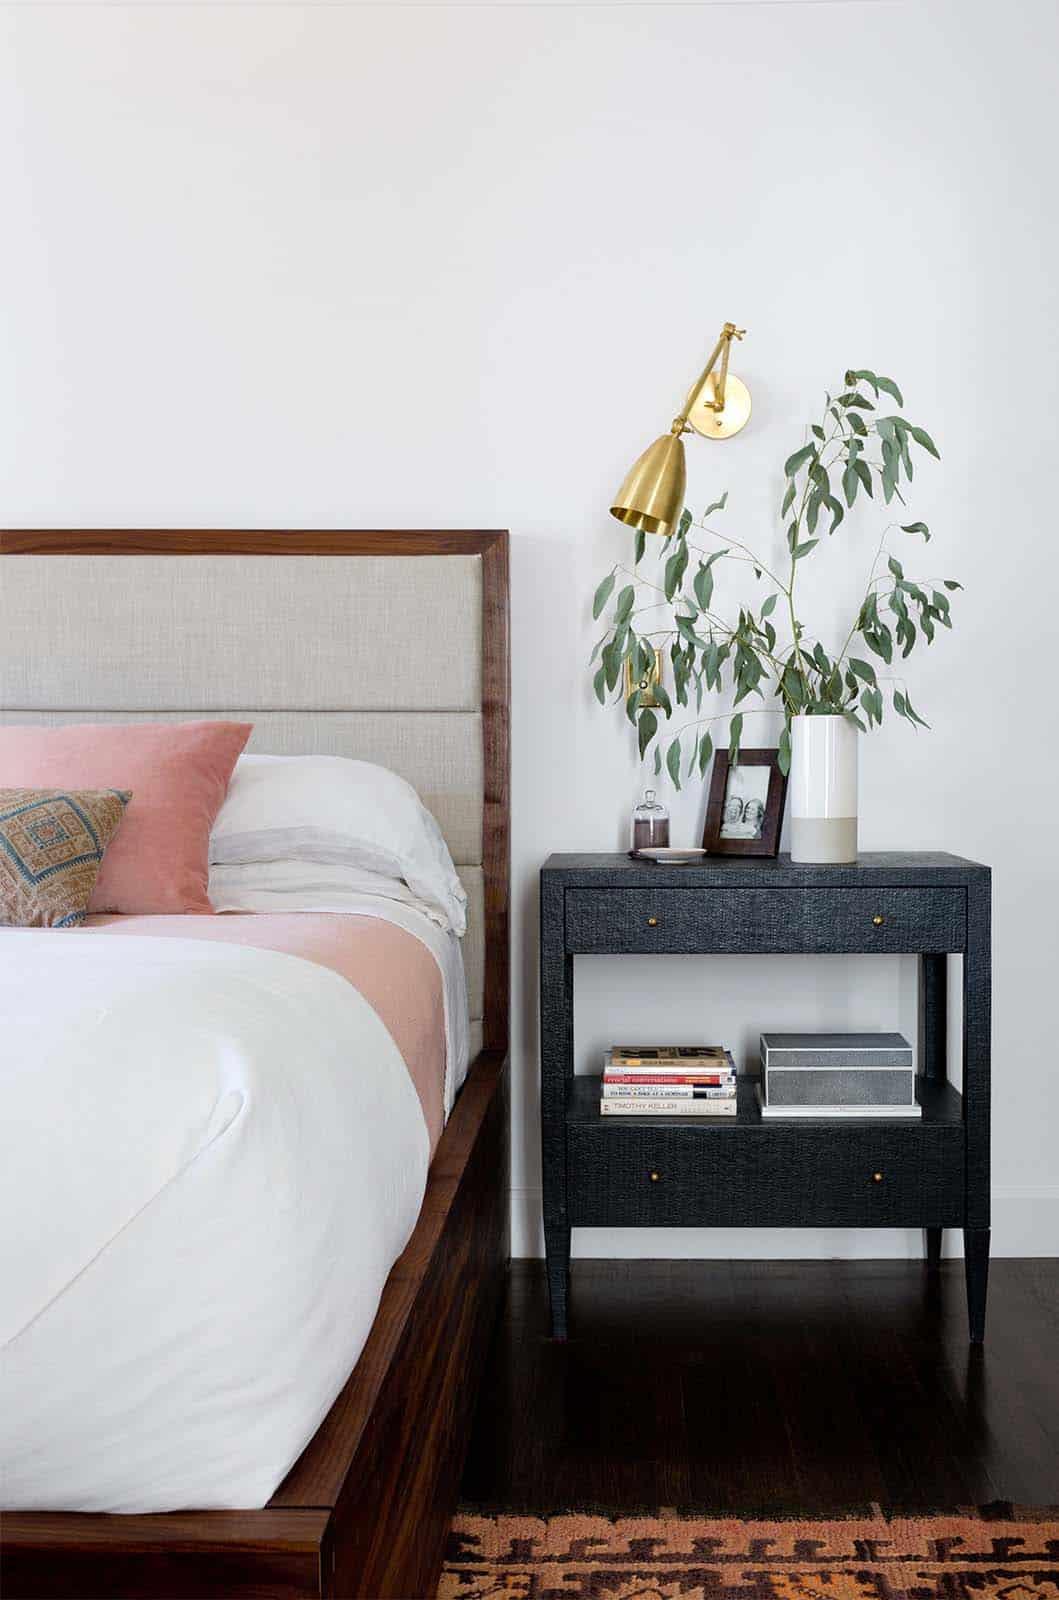 Style espagnol Home-Jette Creative-12-1 Kindesign